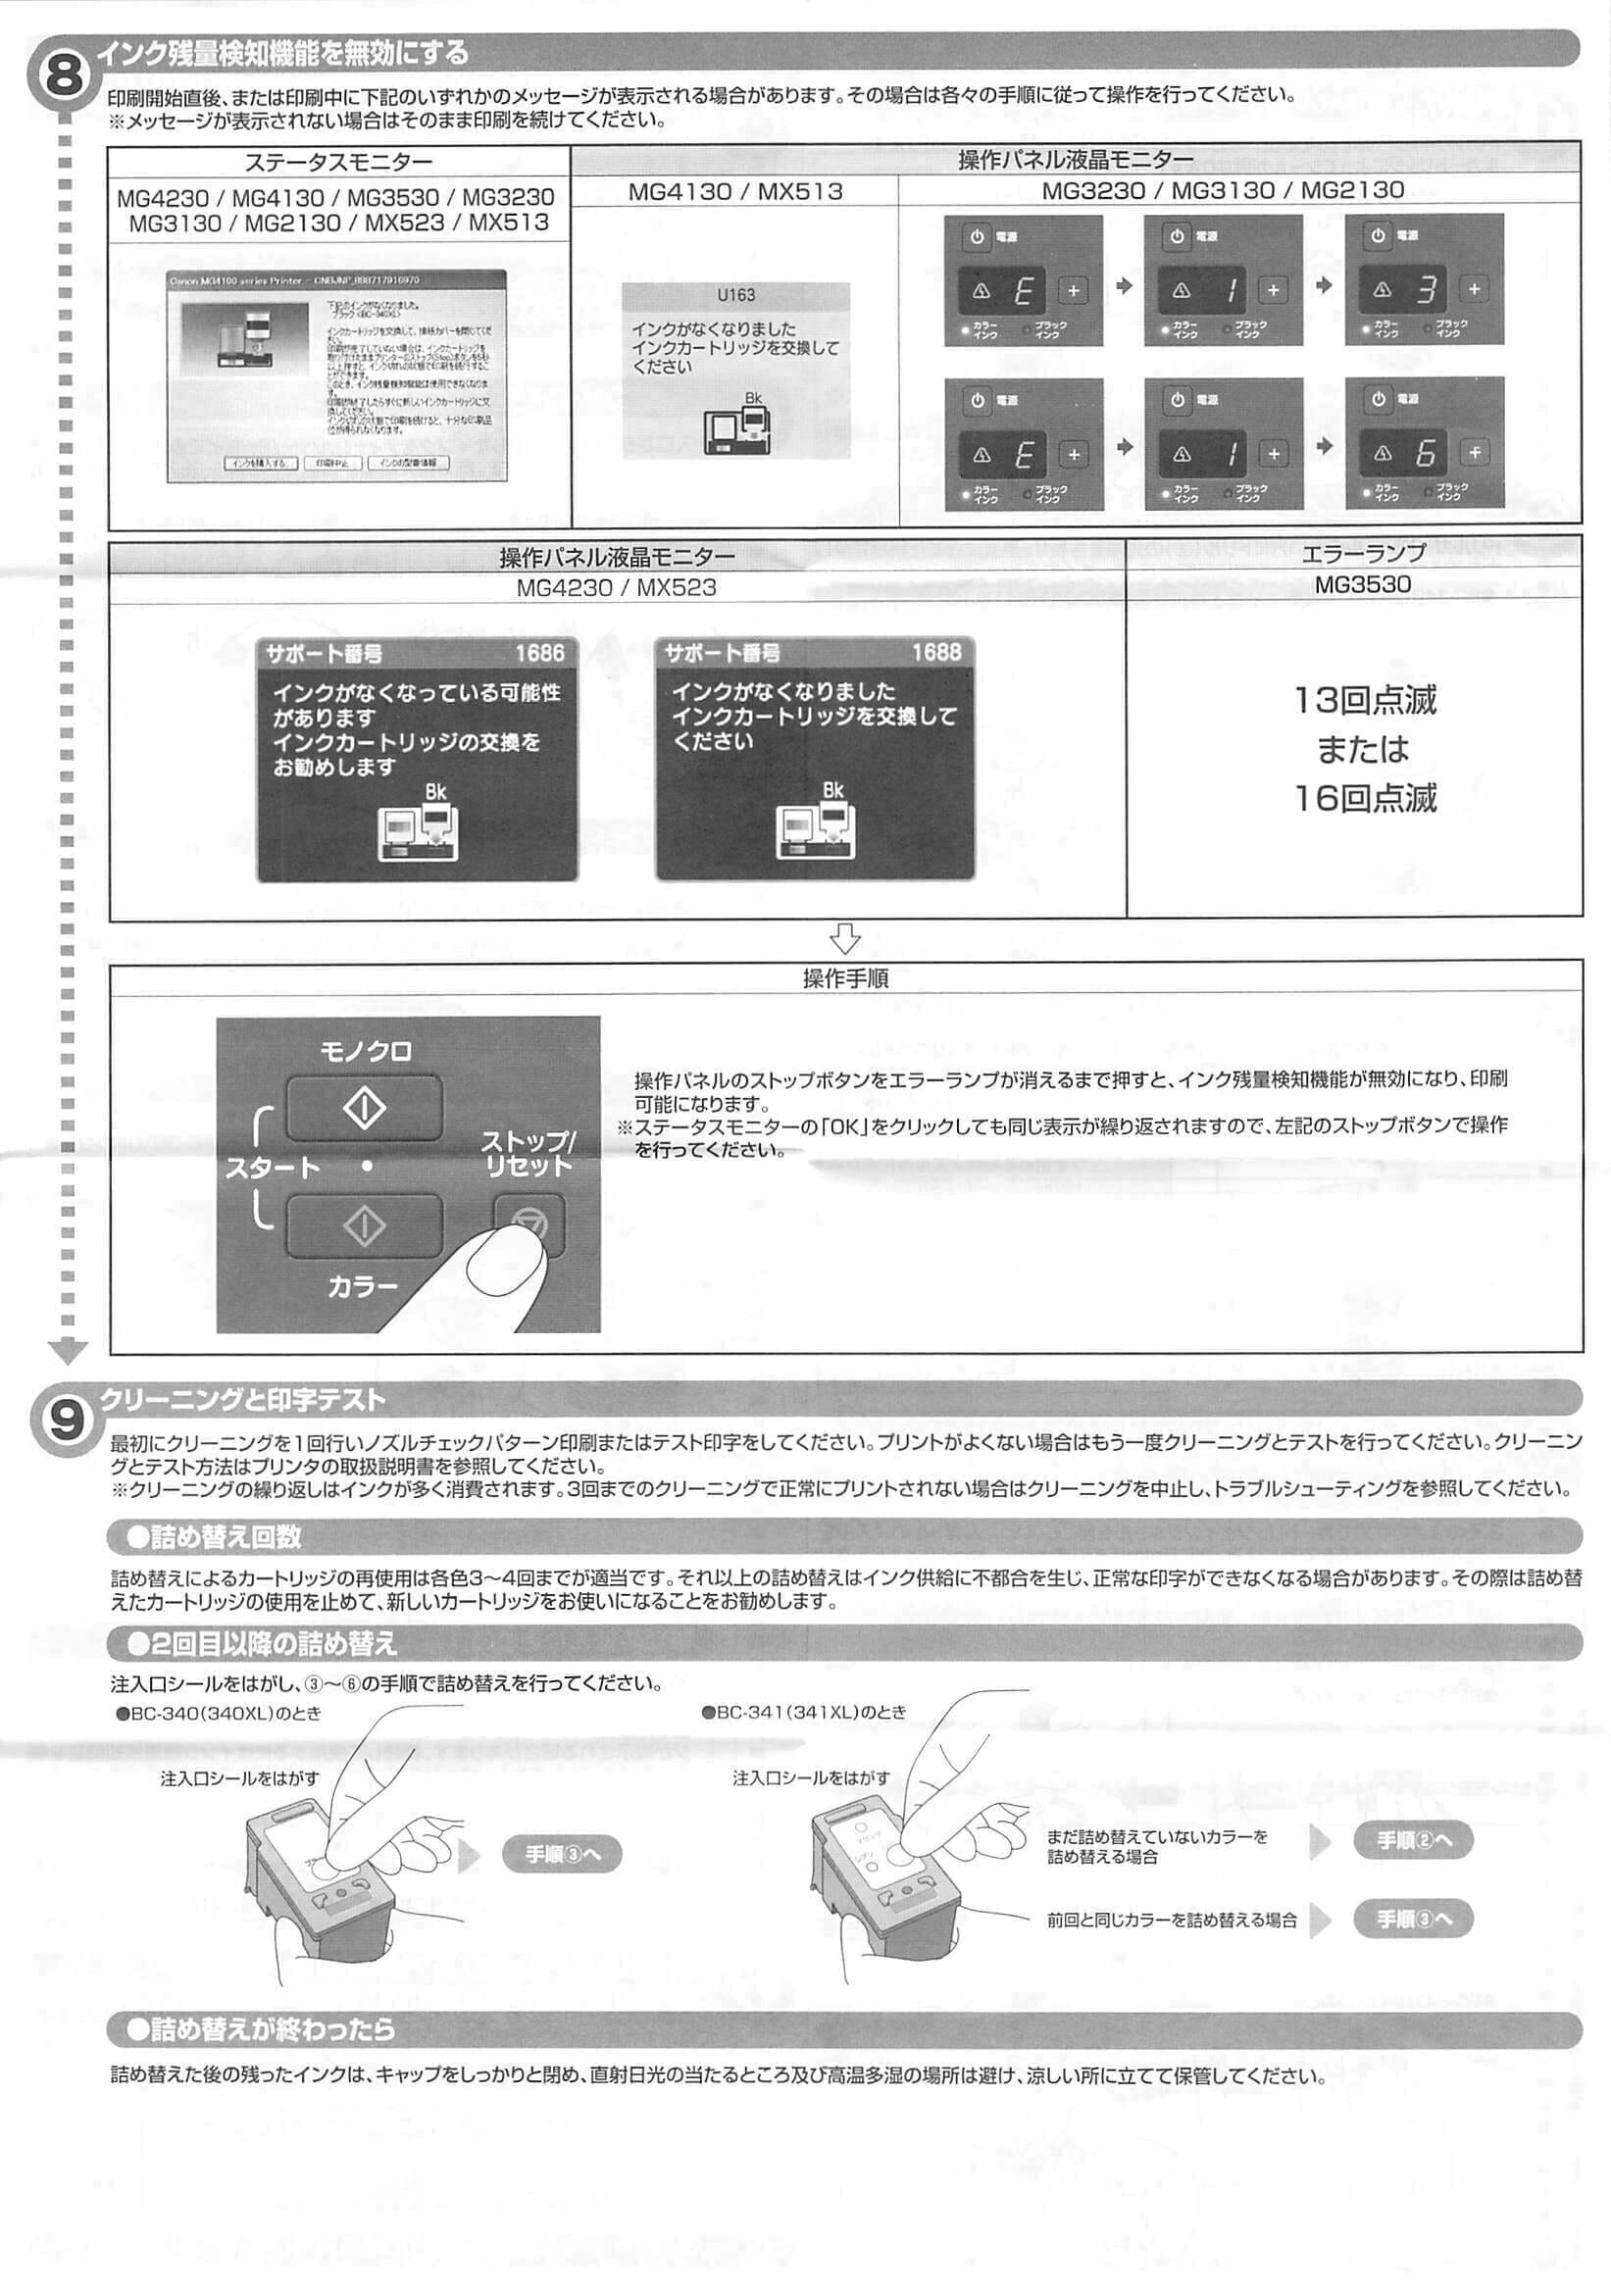 MG3630Ink 注入方法2